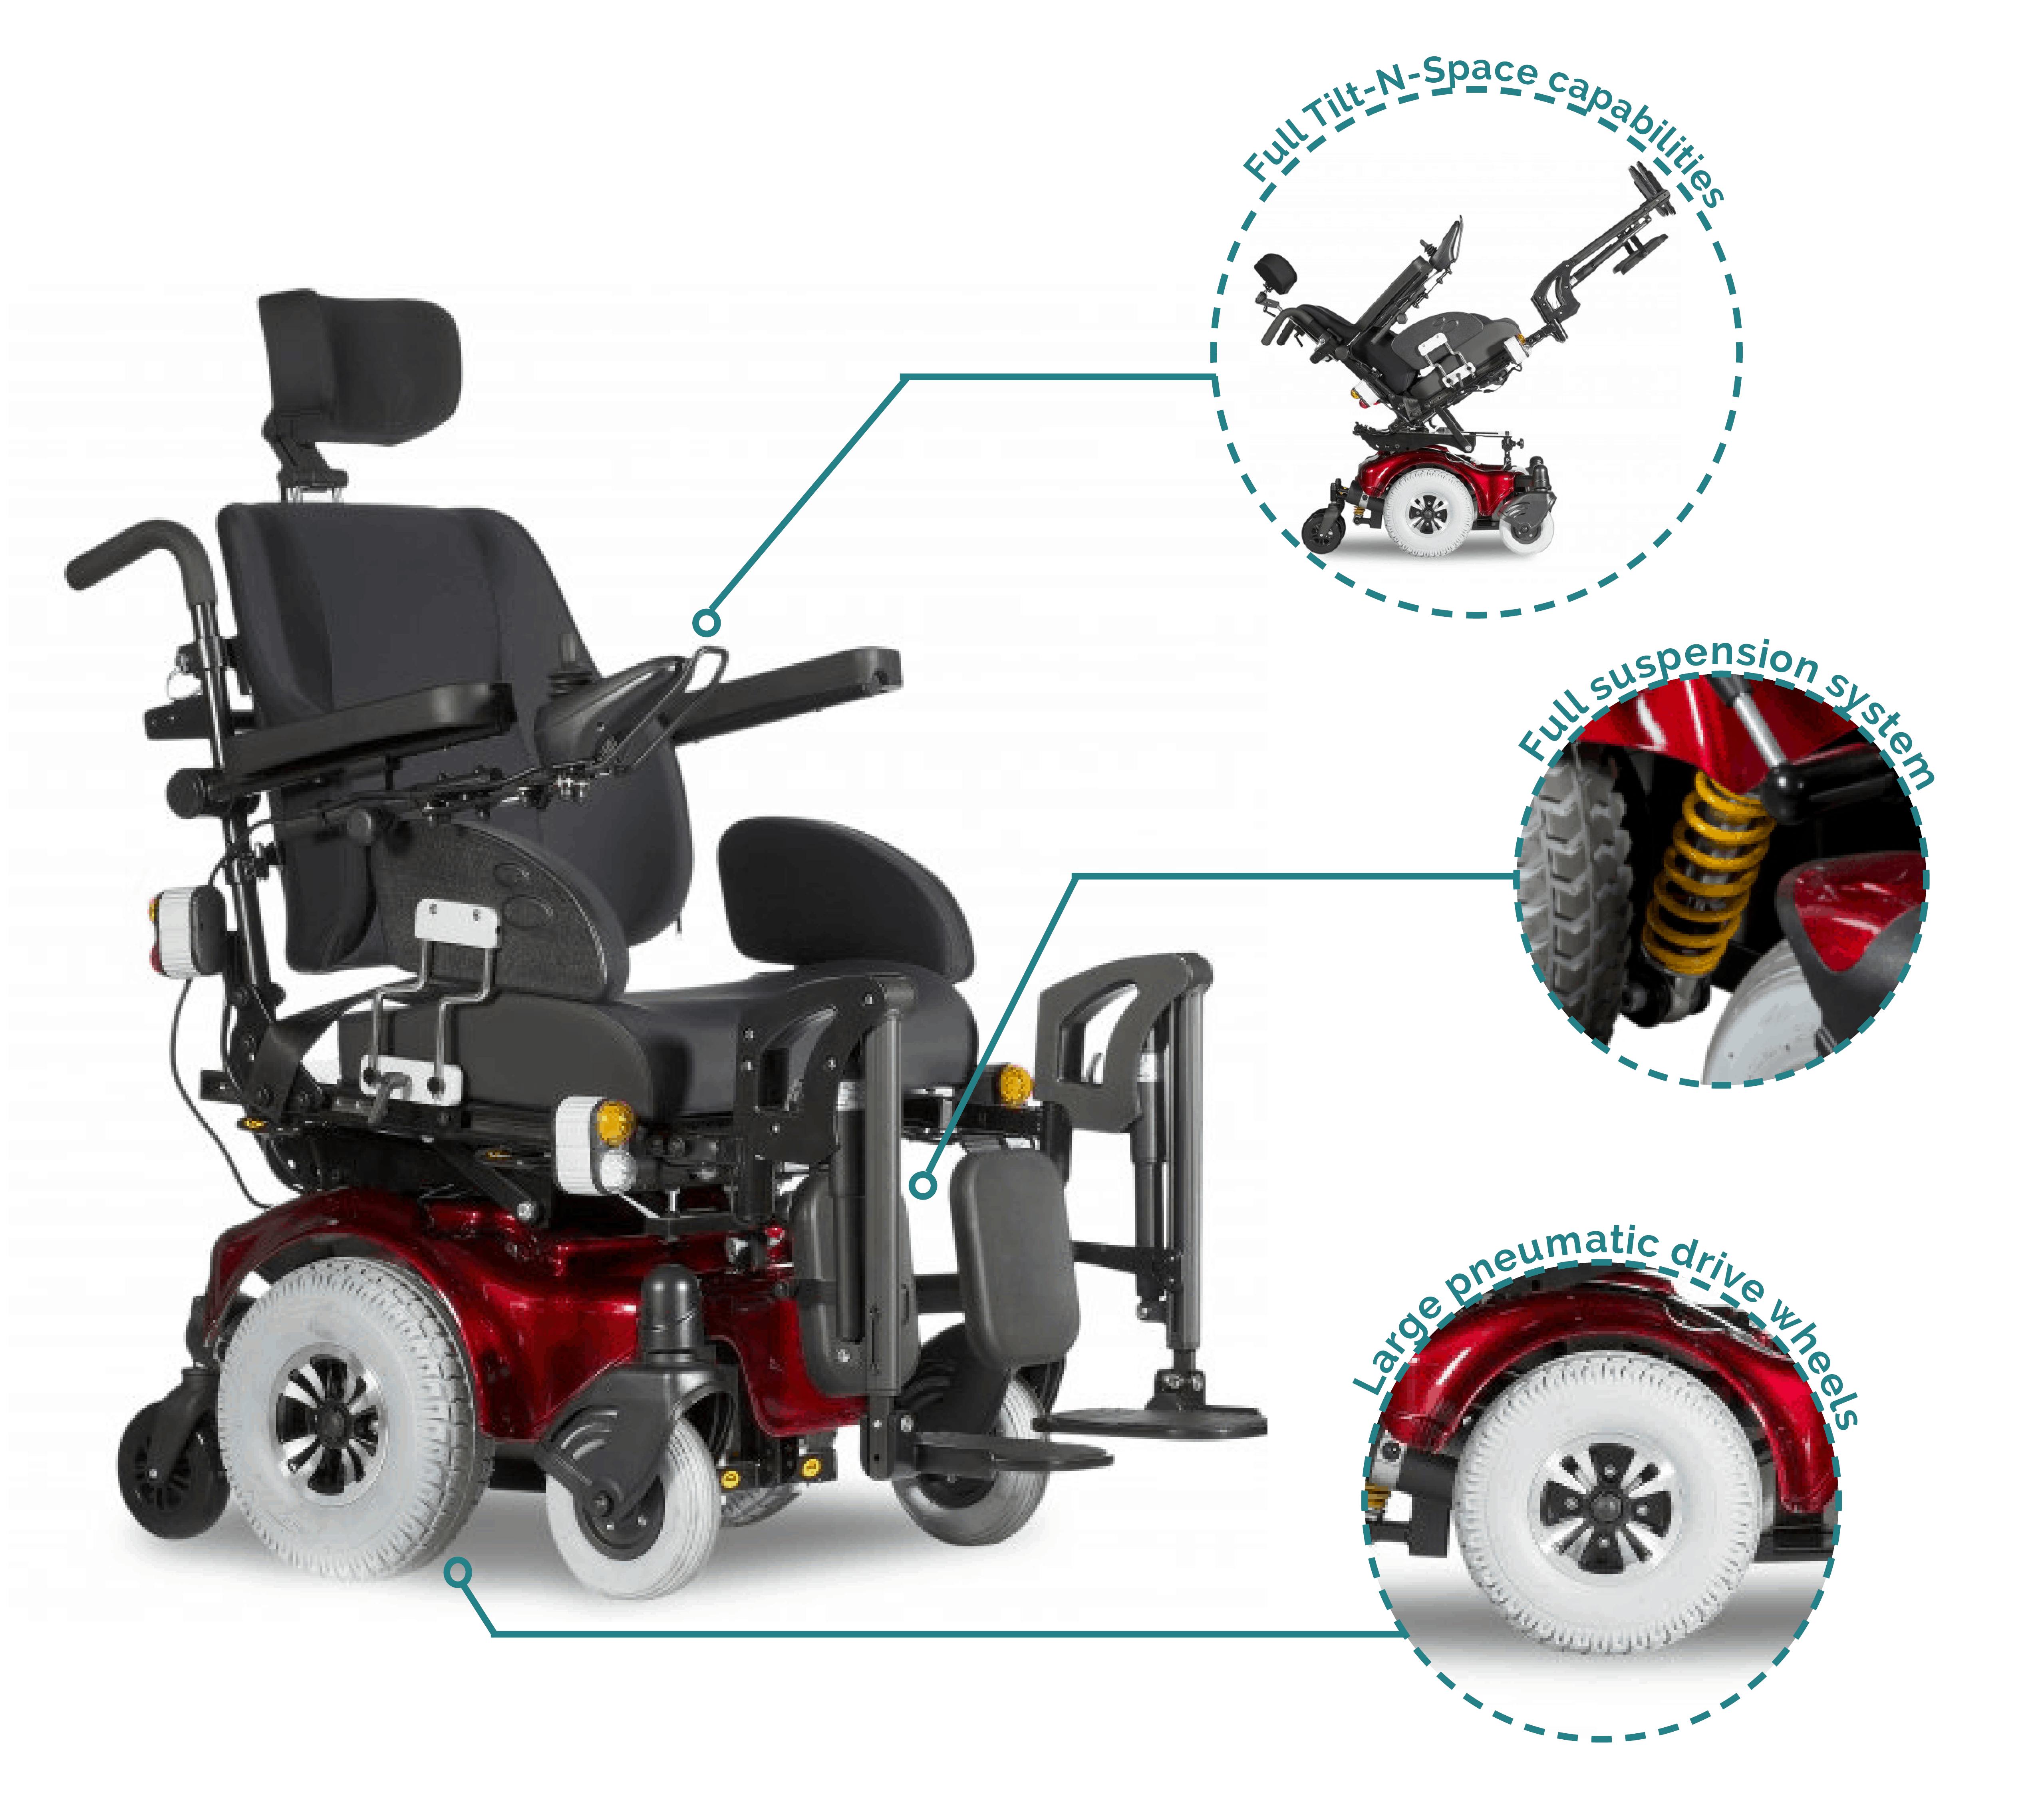 Heartway Allure (HP6RT) Tilt-N-Space Electric Wheelchair